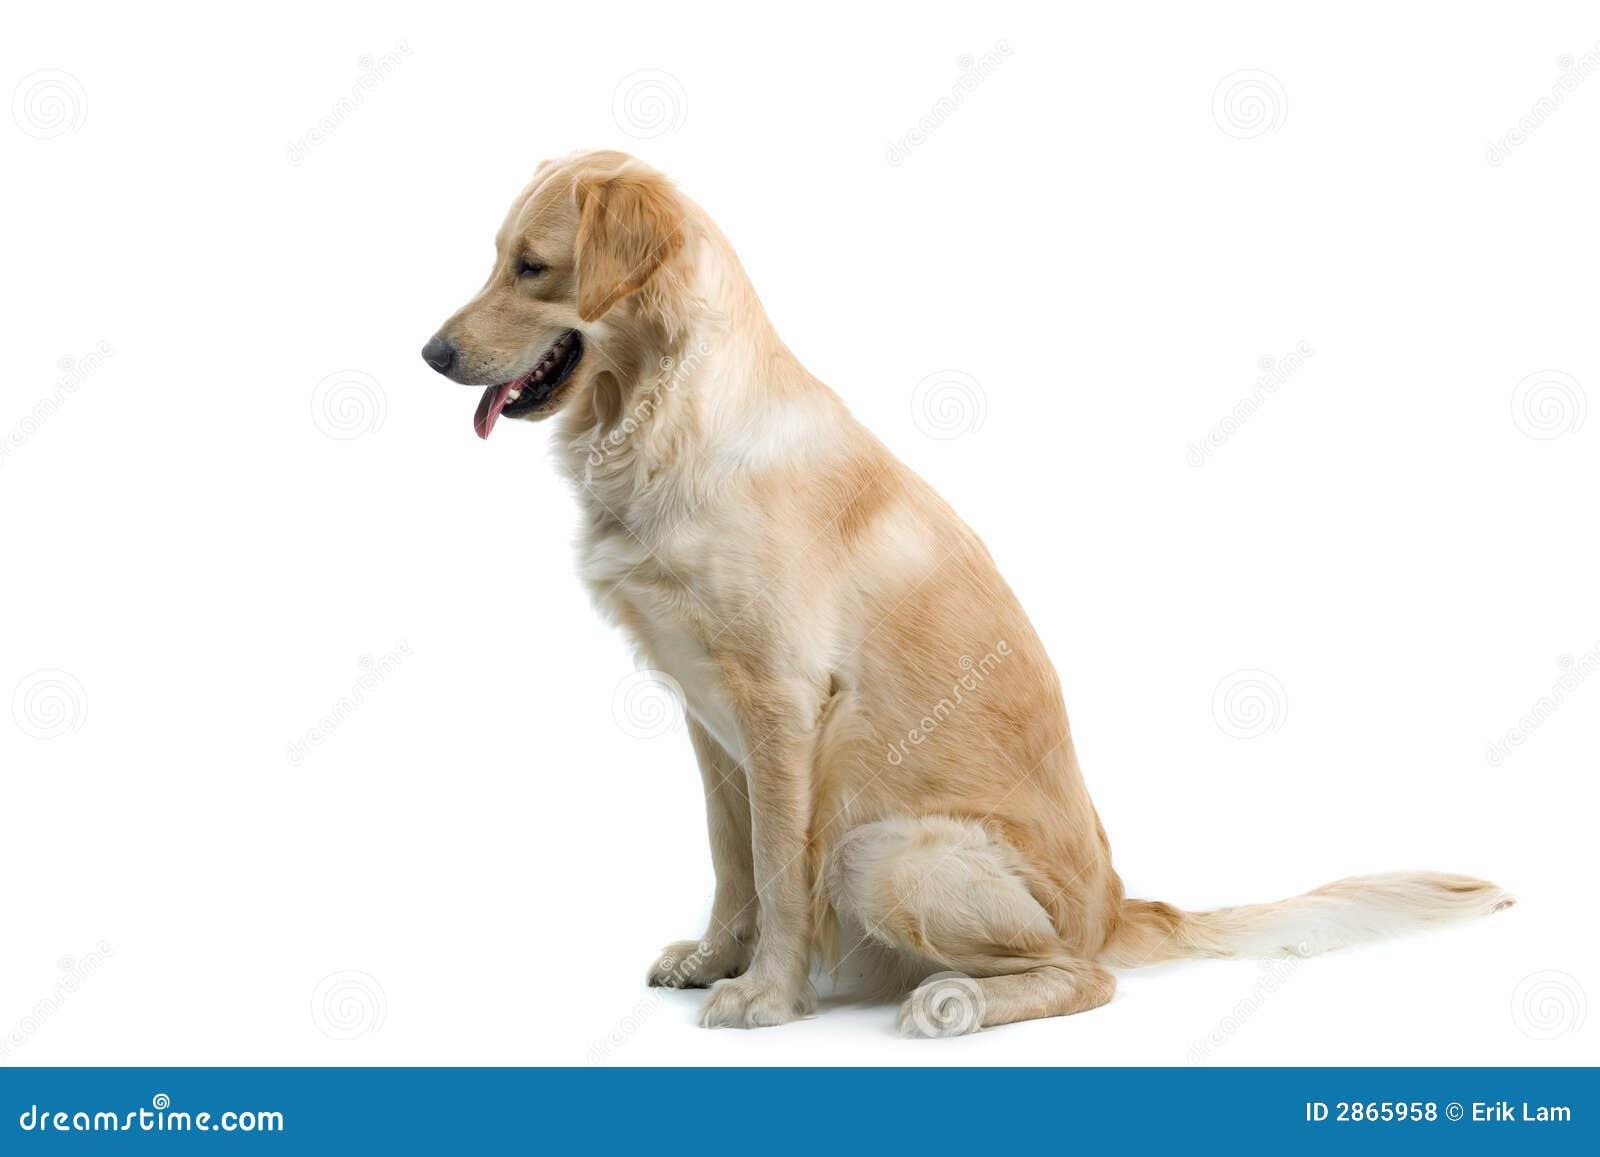 sitting dog royalty free stock photos